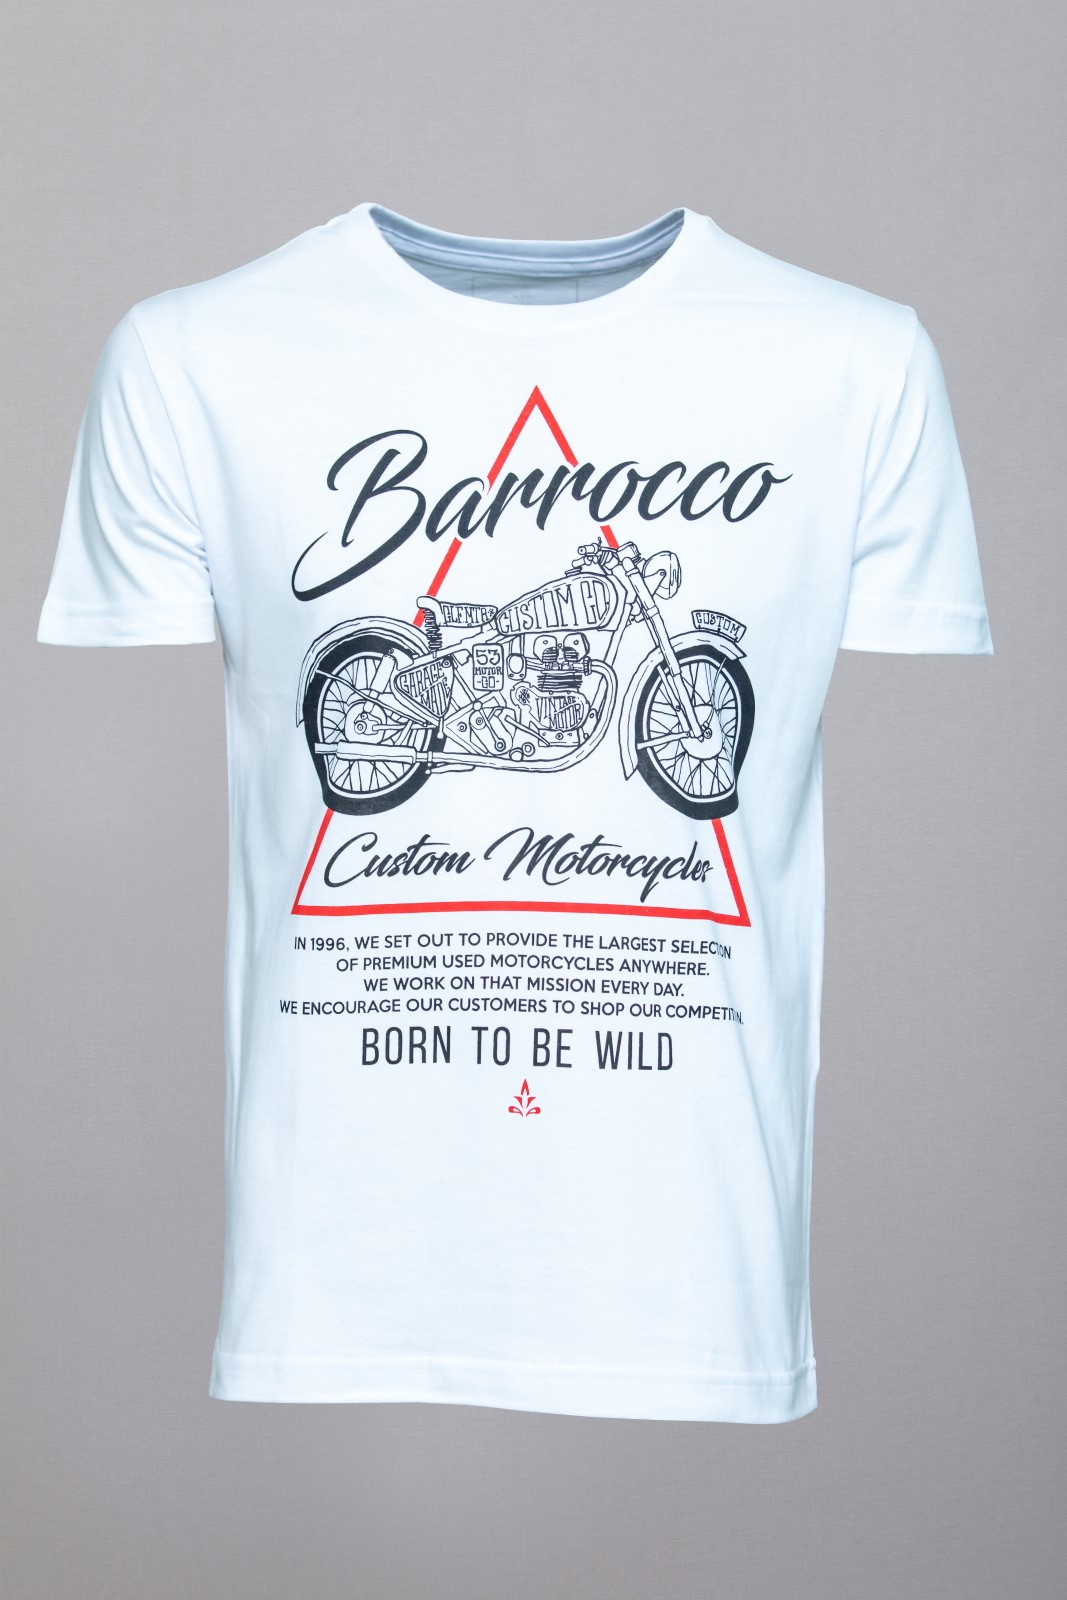 Kit Camisetas Barrocco Motos - 3 Camisetas Cor Branca/ Tamanho M